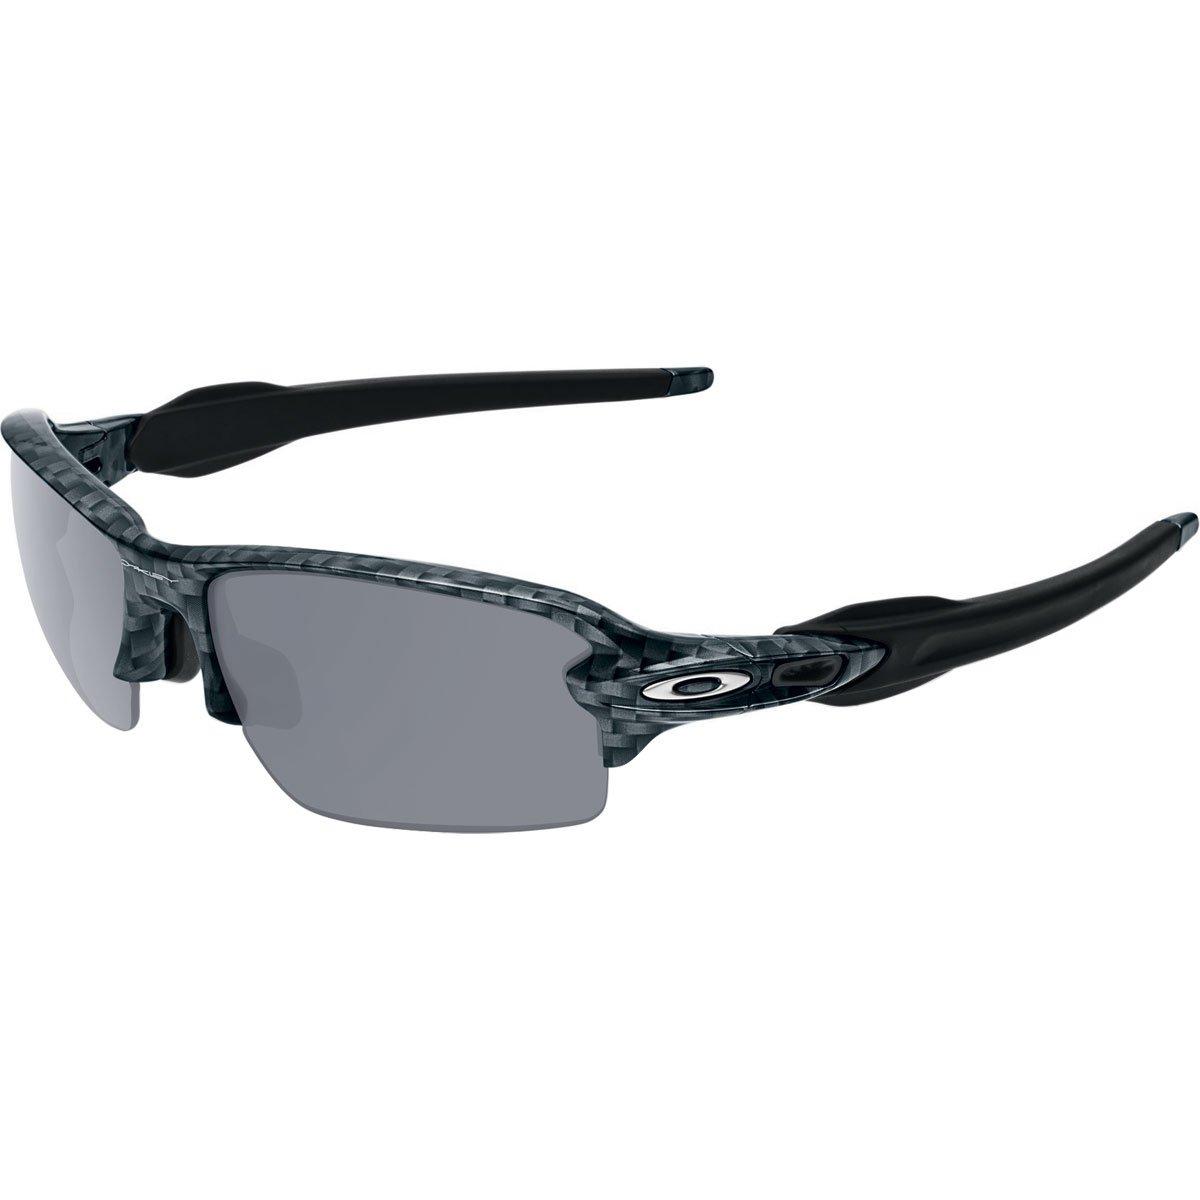 Oo9271 Asian 06 Oakley 0 Fit Rectangular Flak 2 Sunglasses Men's QxBthorsdC